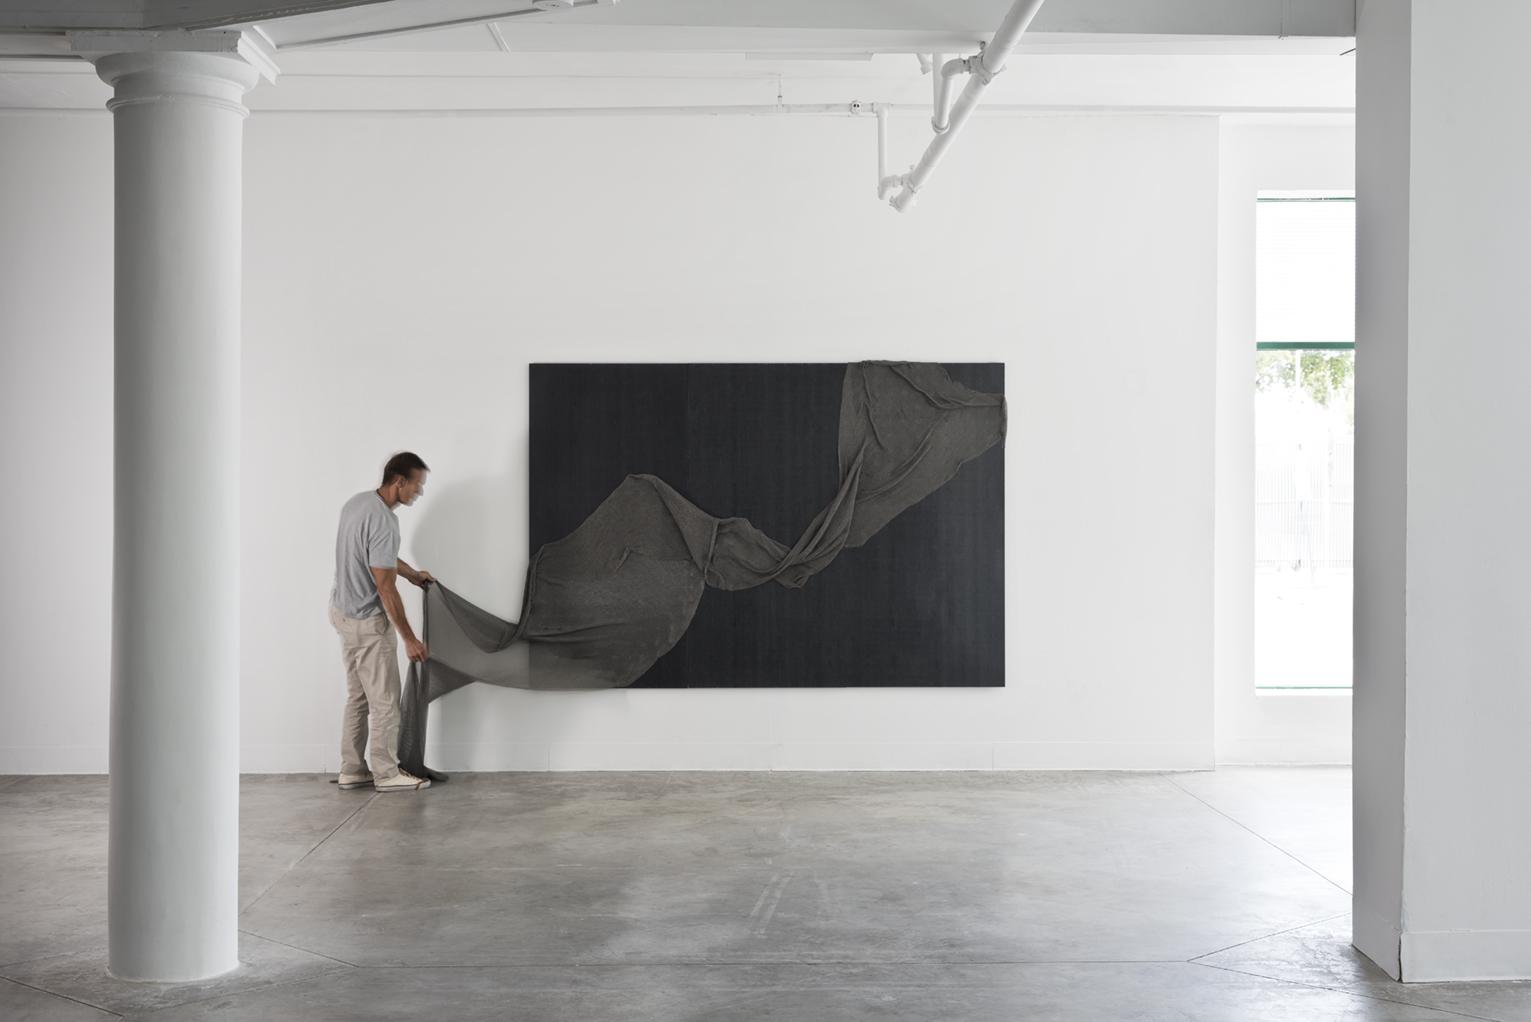 luis-pons-design-art-wallpaper-magnetic_2.jpg